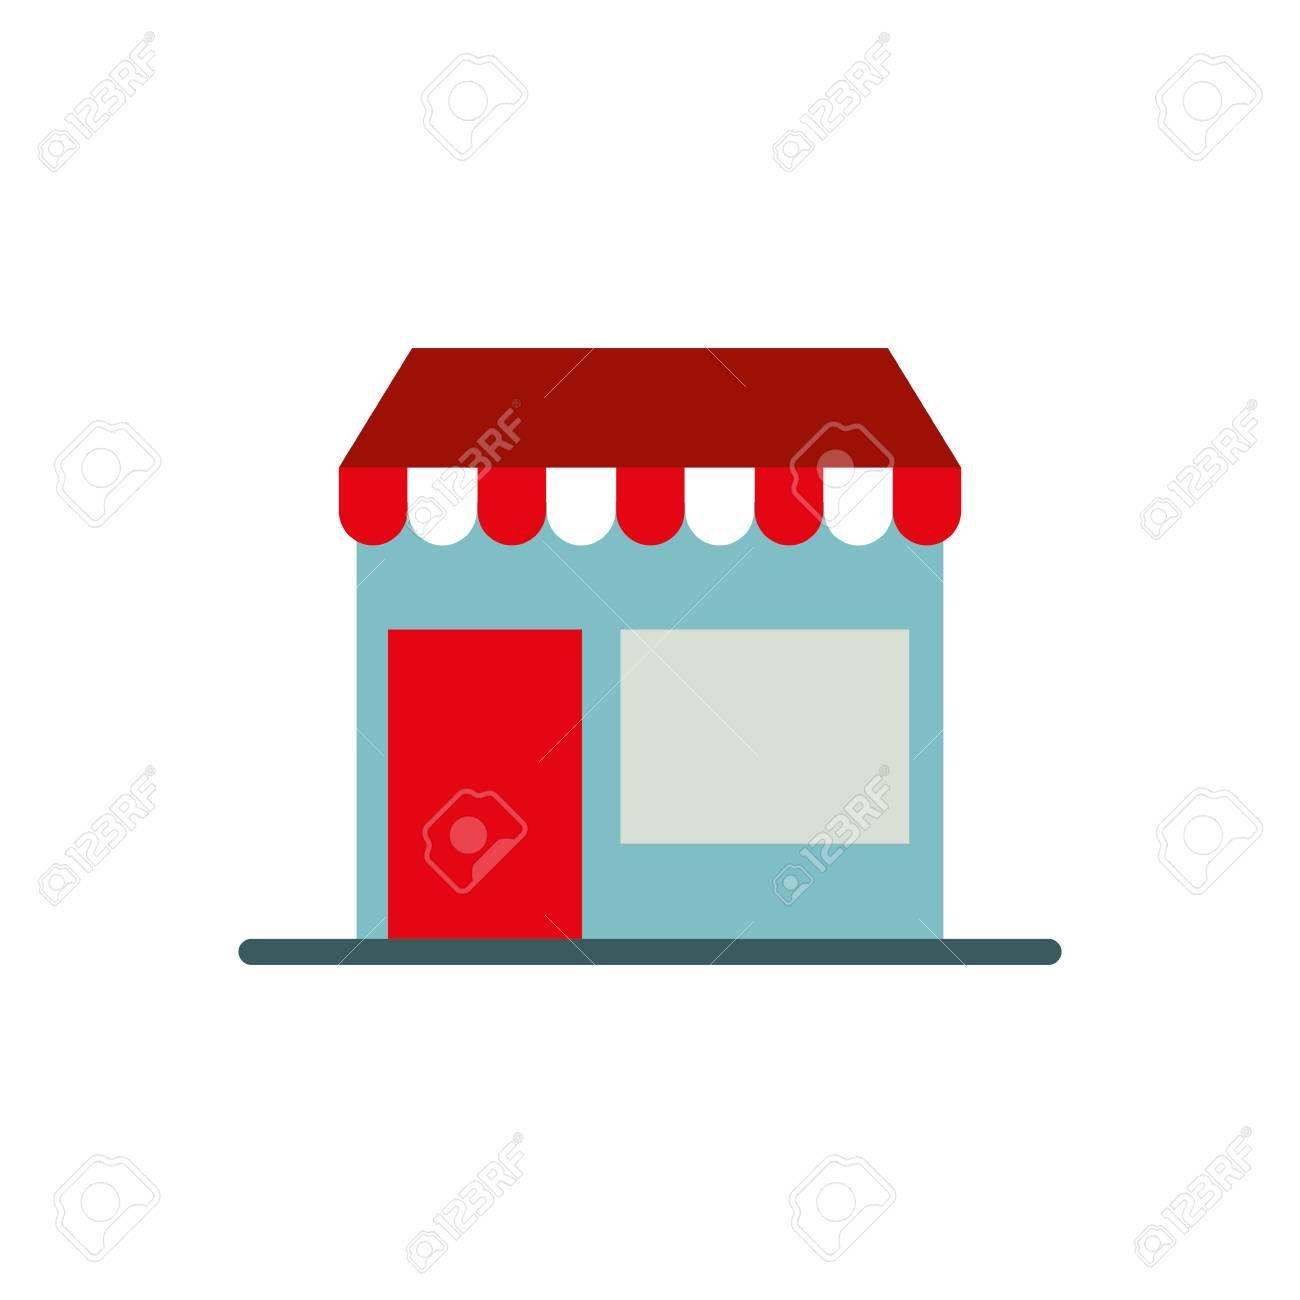 Ecommerce building store digital online button symbol vector illustration - 88975376